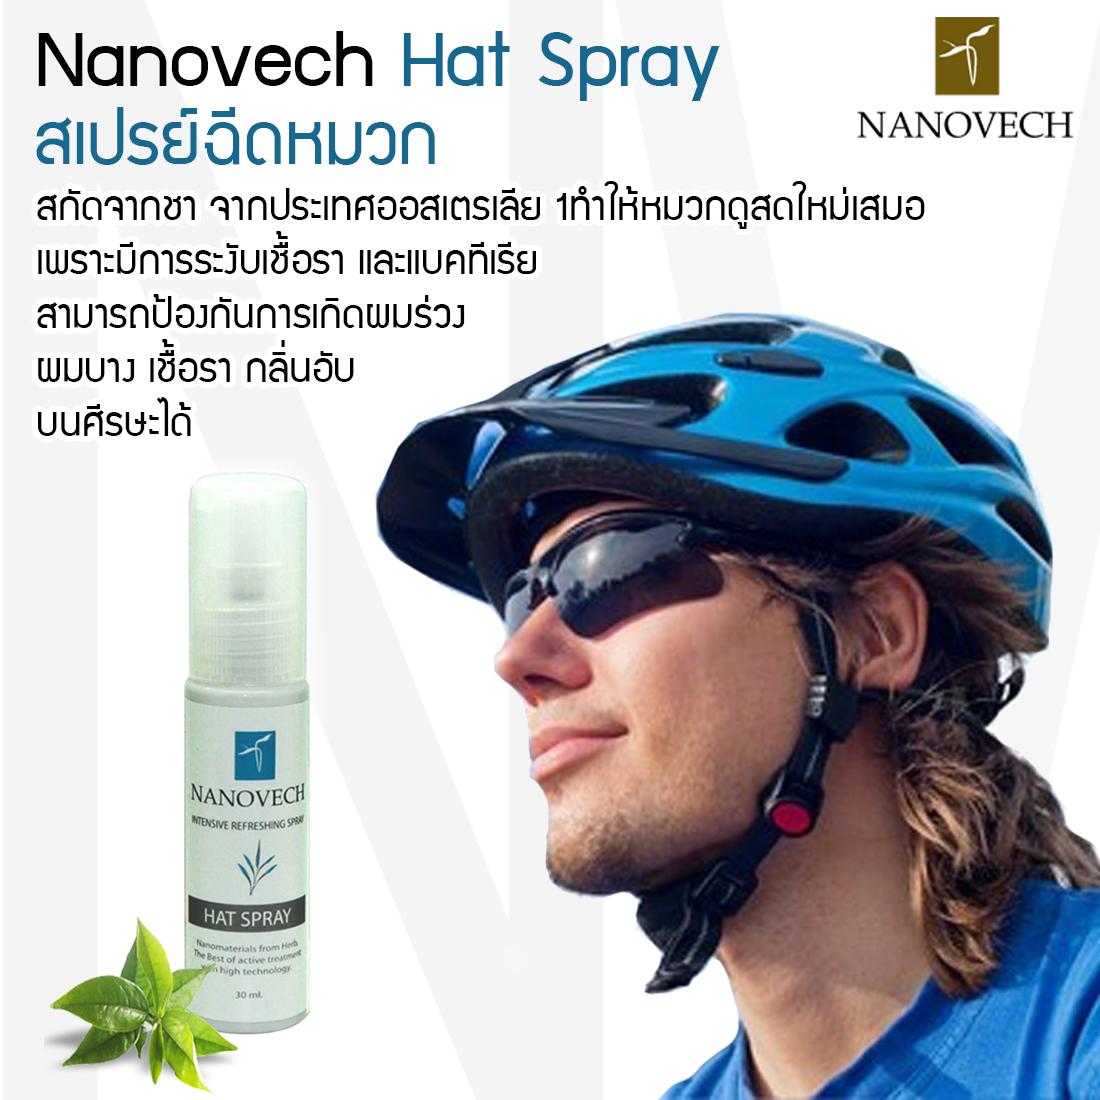 Intensive Refreshing Hat Spray สเปรย์ลดกลิ่นอับ เชื้อรา ในหมวก ซึ่งเป็นสาเหตุผมร่วง ขนาด 30ml.